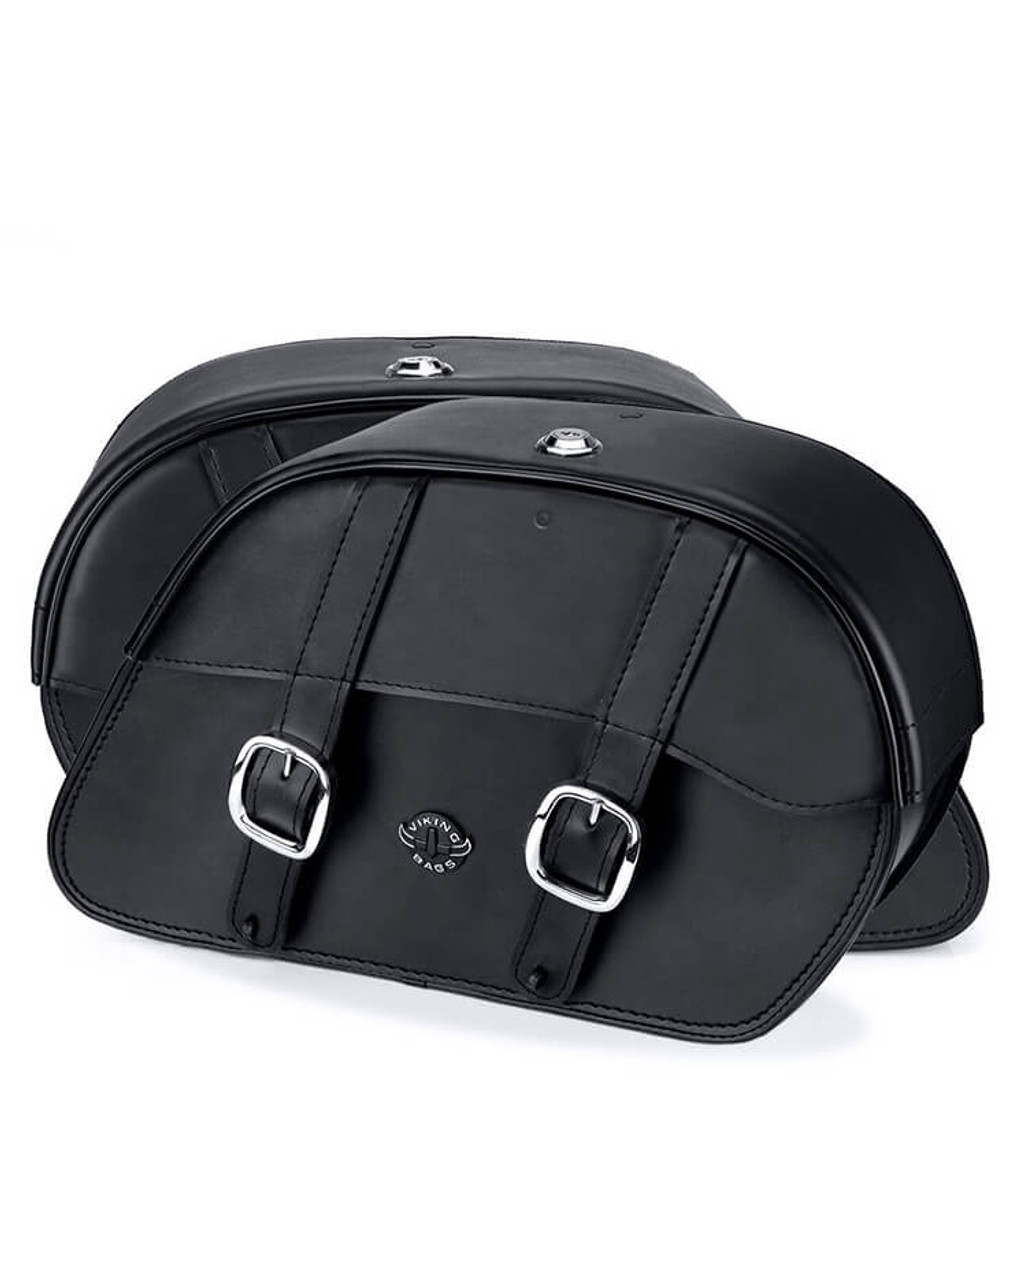 Honda VTX 1300 C Medium Charger Slanted Motorcycle Saddlebags Both Bags View